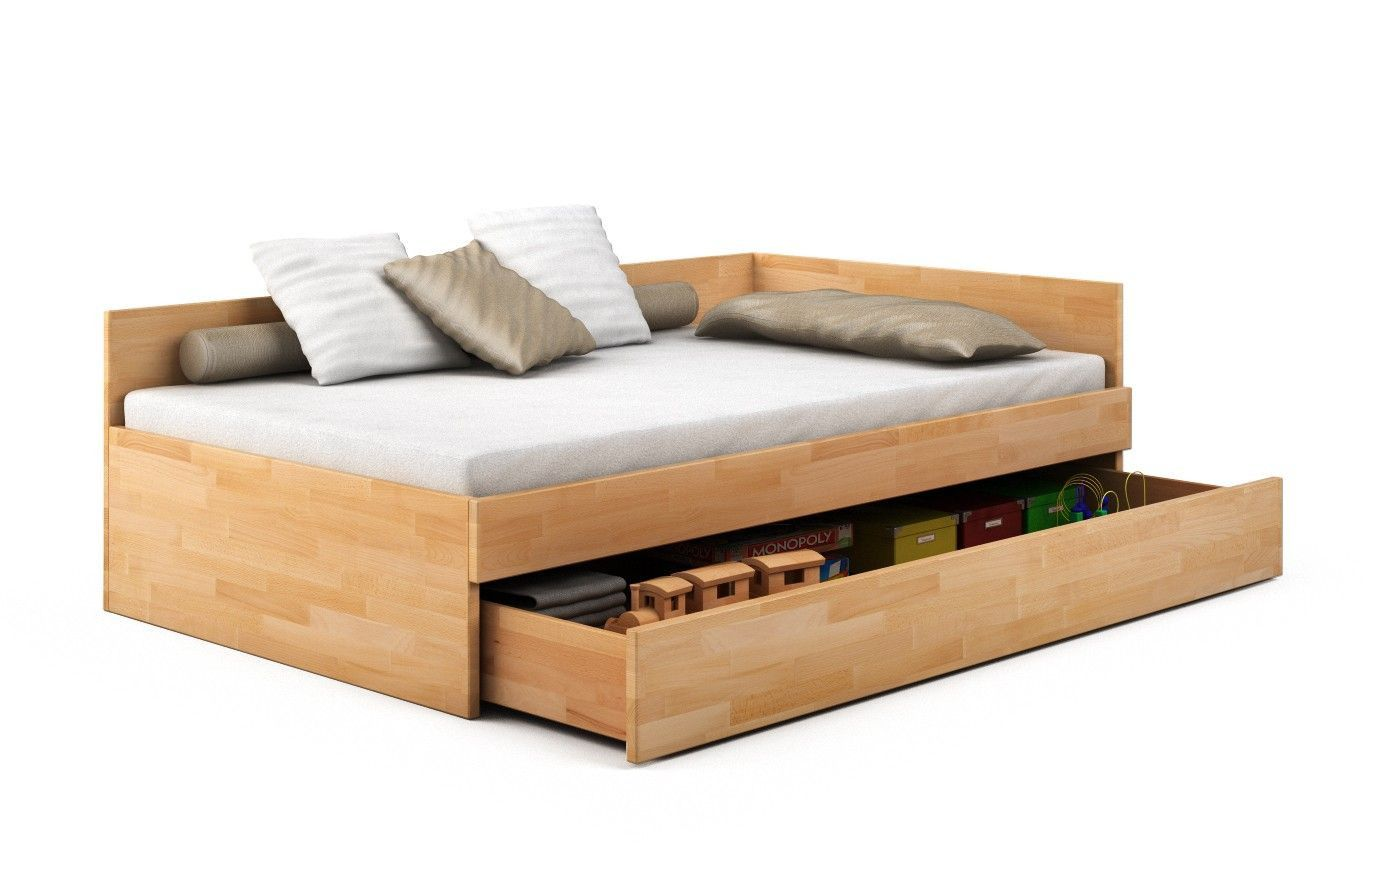 Bett 120 200 Holz Best Of Bett Buche Tigre Massivholz Pv 120 X 200 Cm Nein